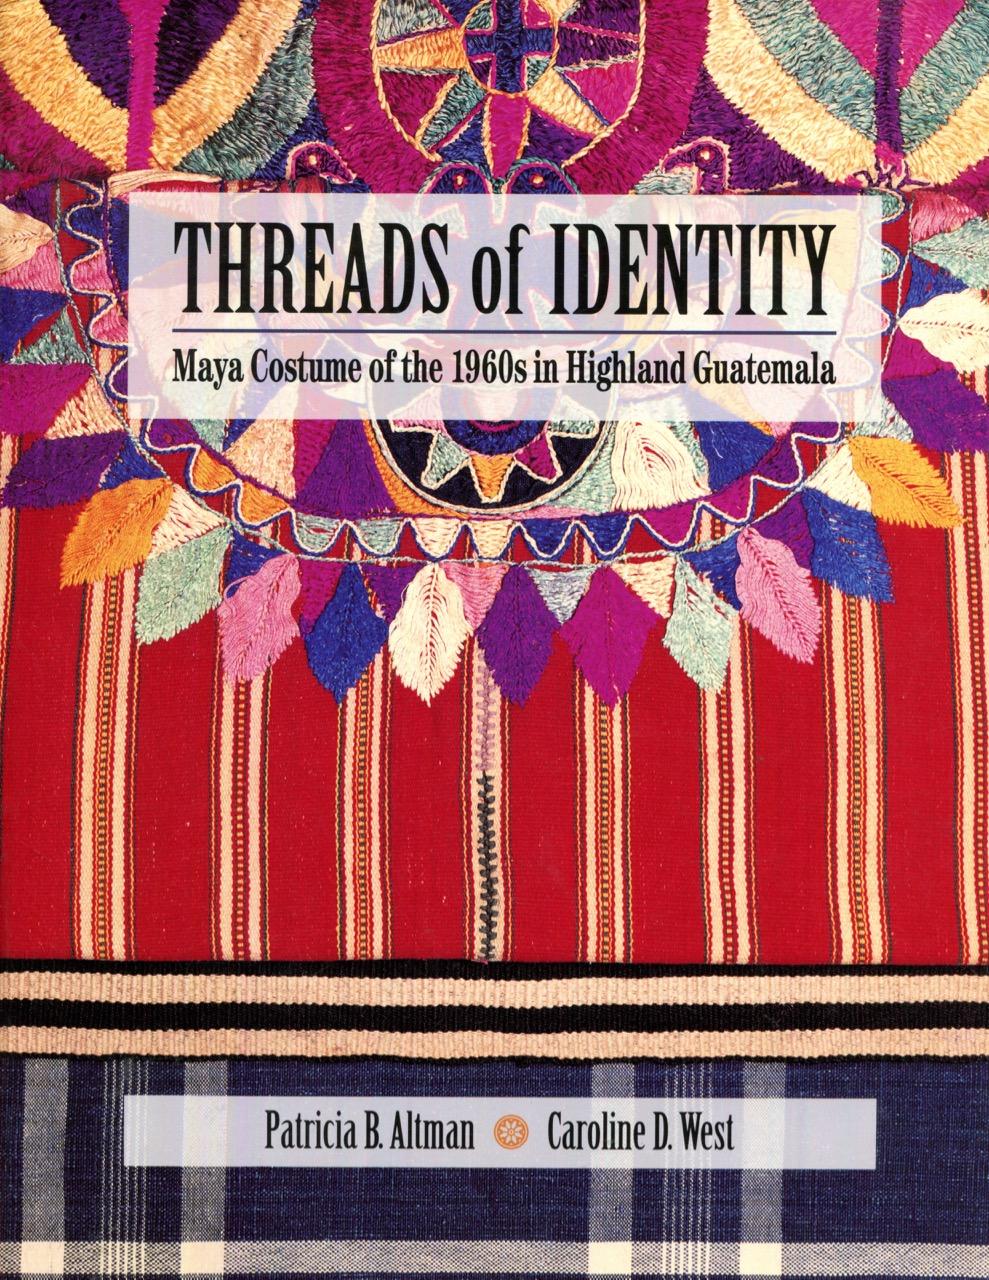 Threads of Identity: Maya Costume of the 1960s in Highland Guatemala